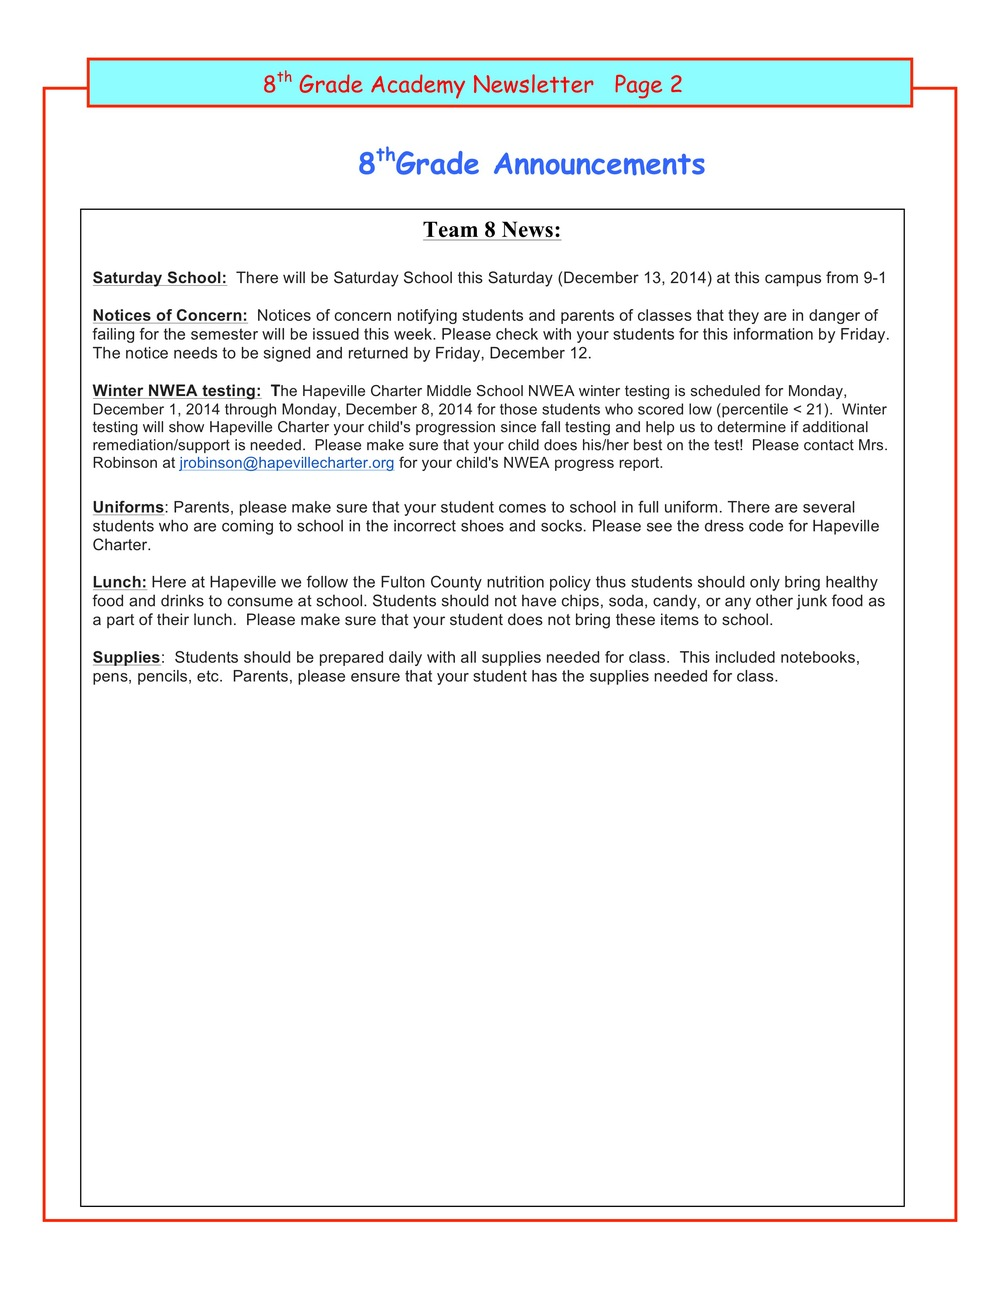 Newsletter Image8th grade December 8 2.jpeg